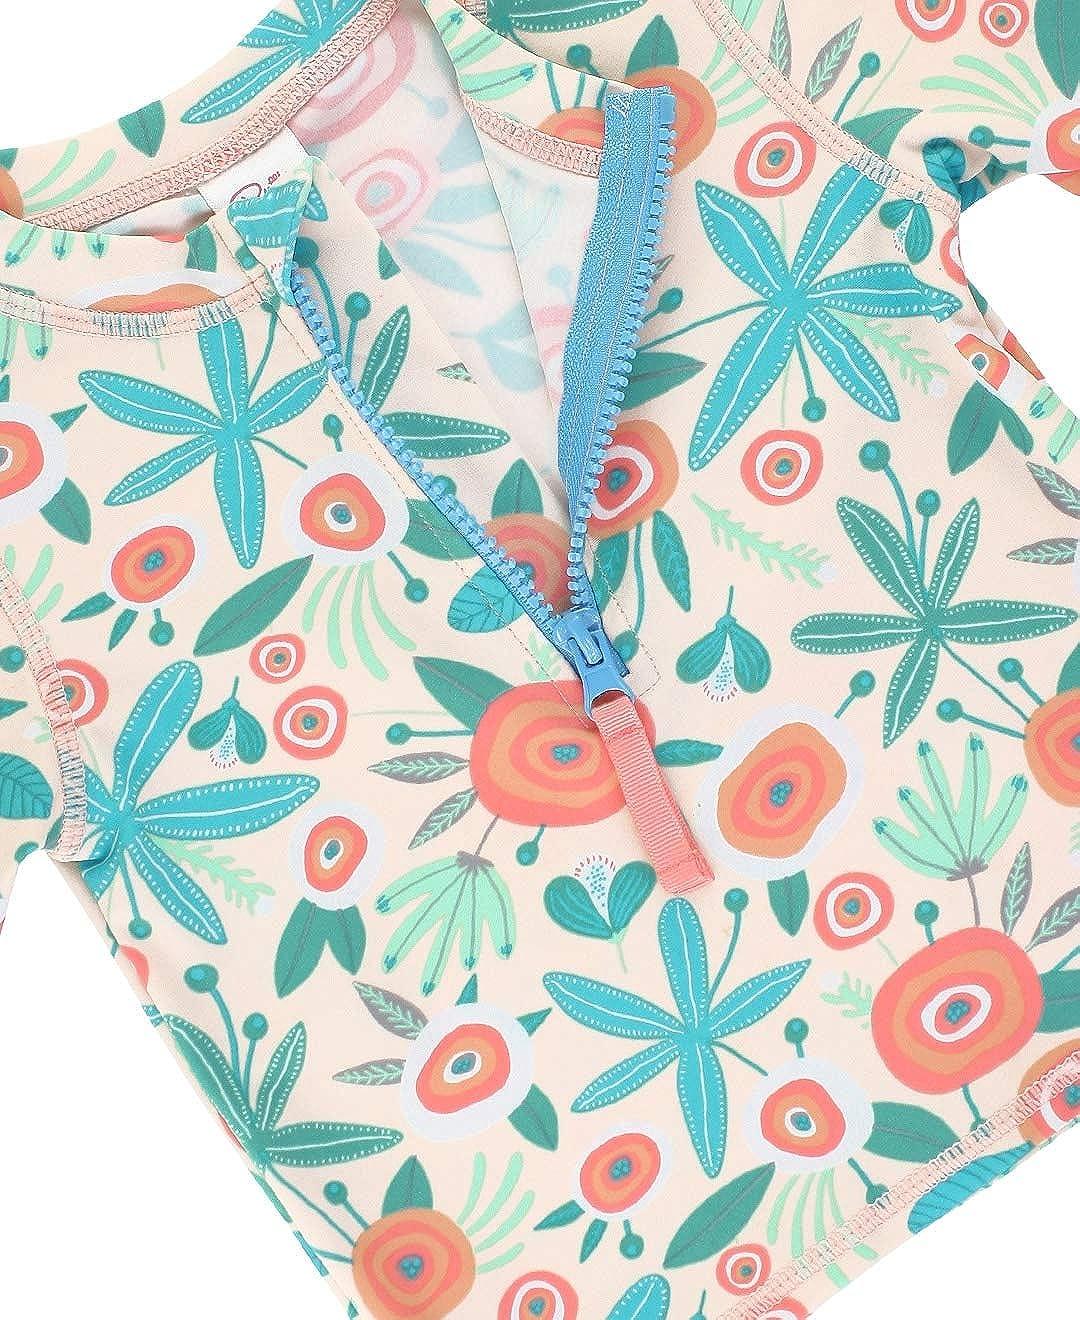 RuffleButts Baby//Toddler Girls Long Sleeve Rash Guard 2 Piece Swimsuit Set w//UPF 50 Sun Protection with Zipper